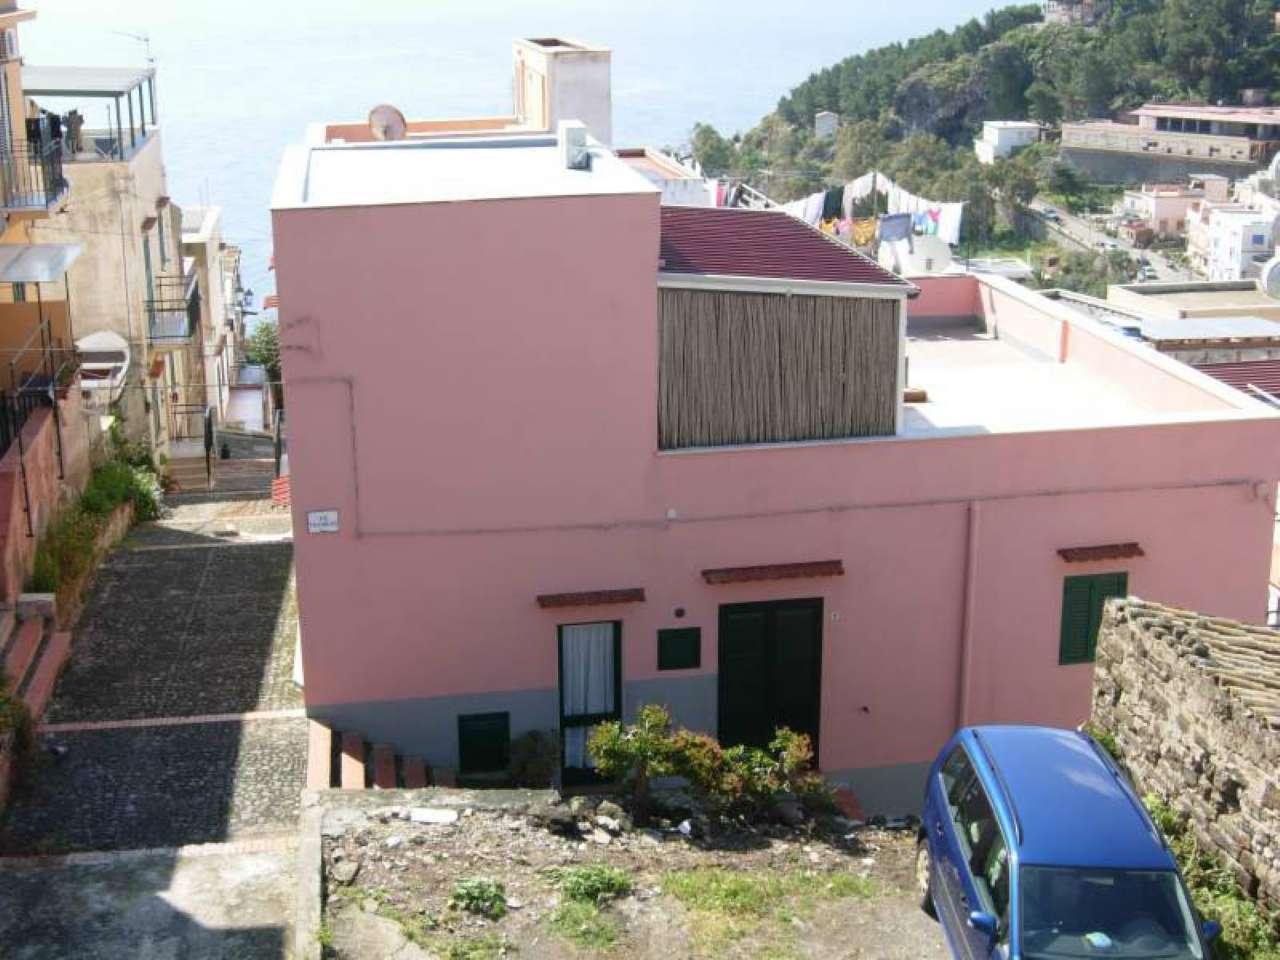 Casa indipendente in Vendita a Ustica: 3 locali, 100 mq